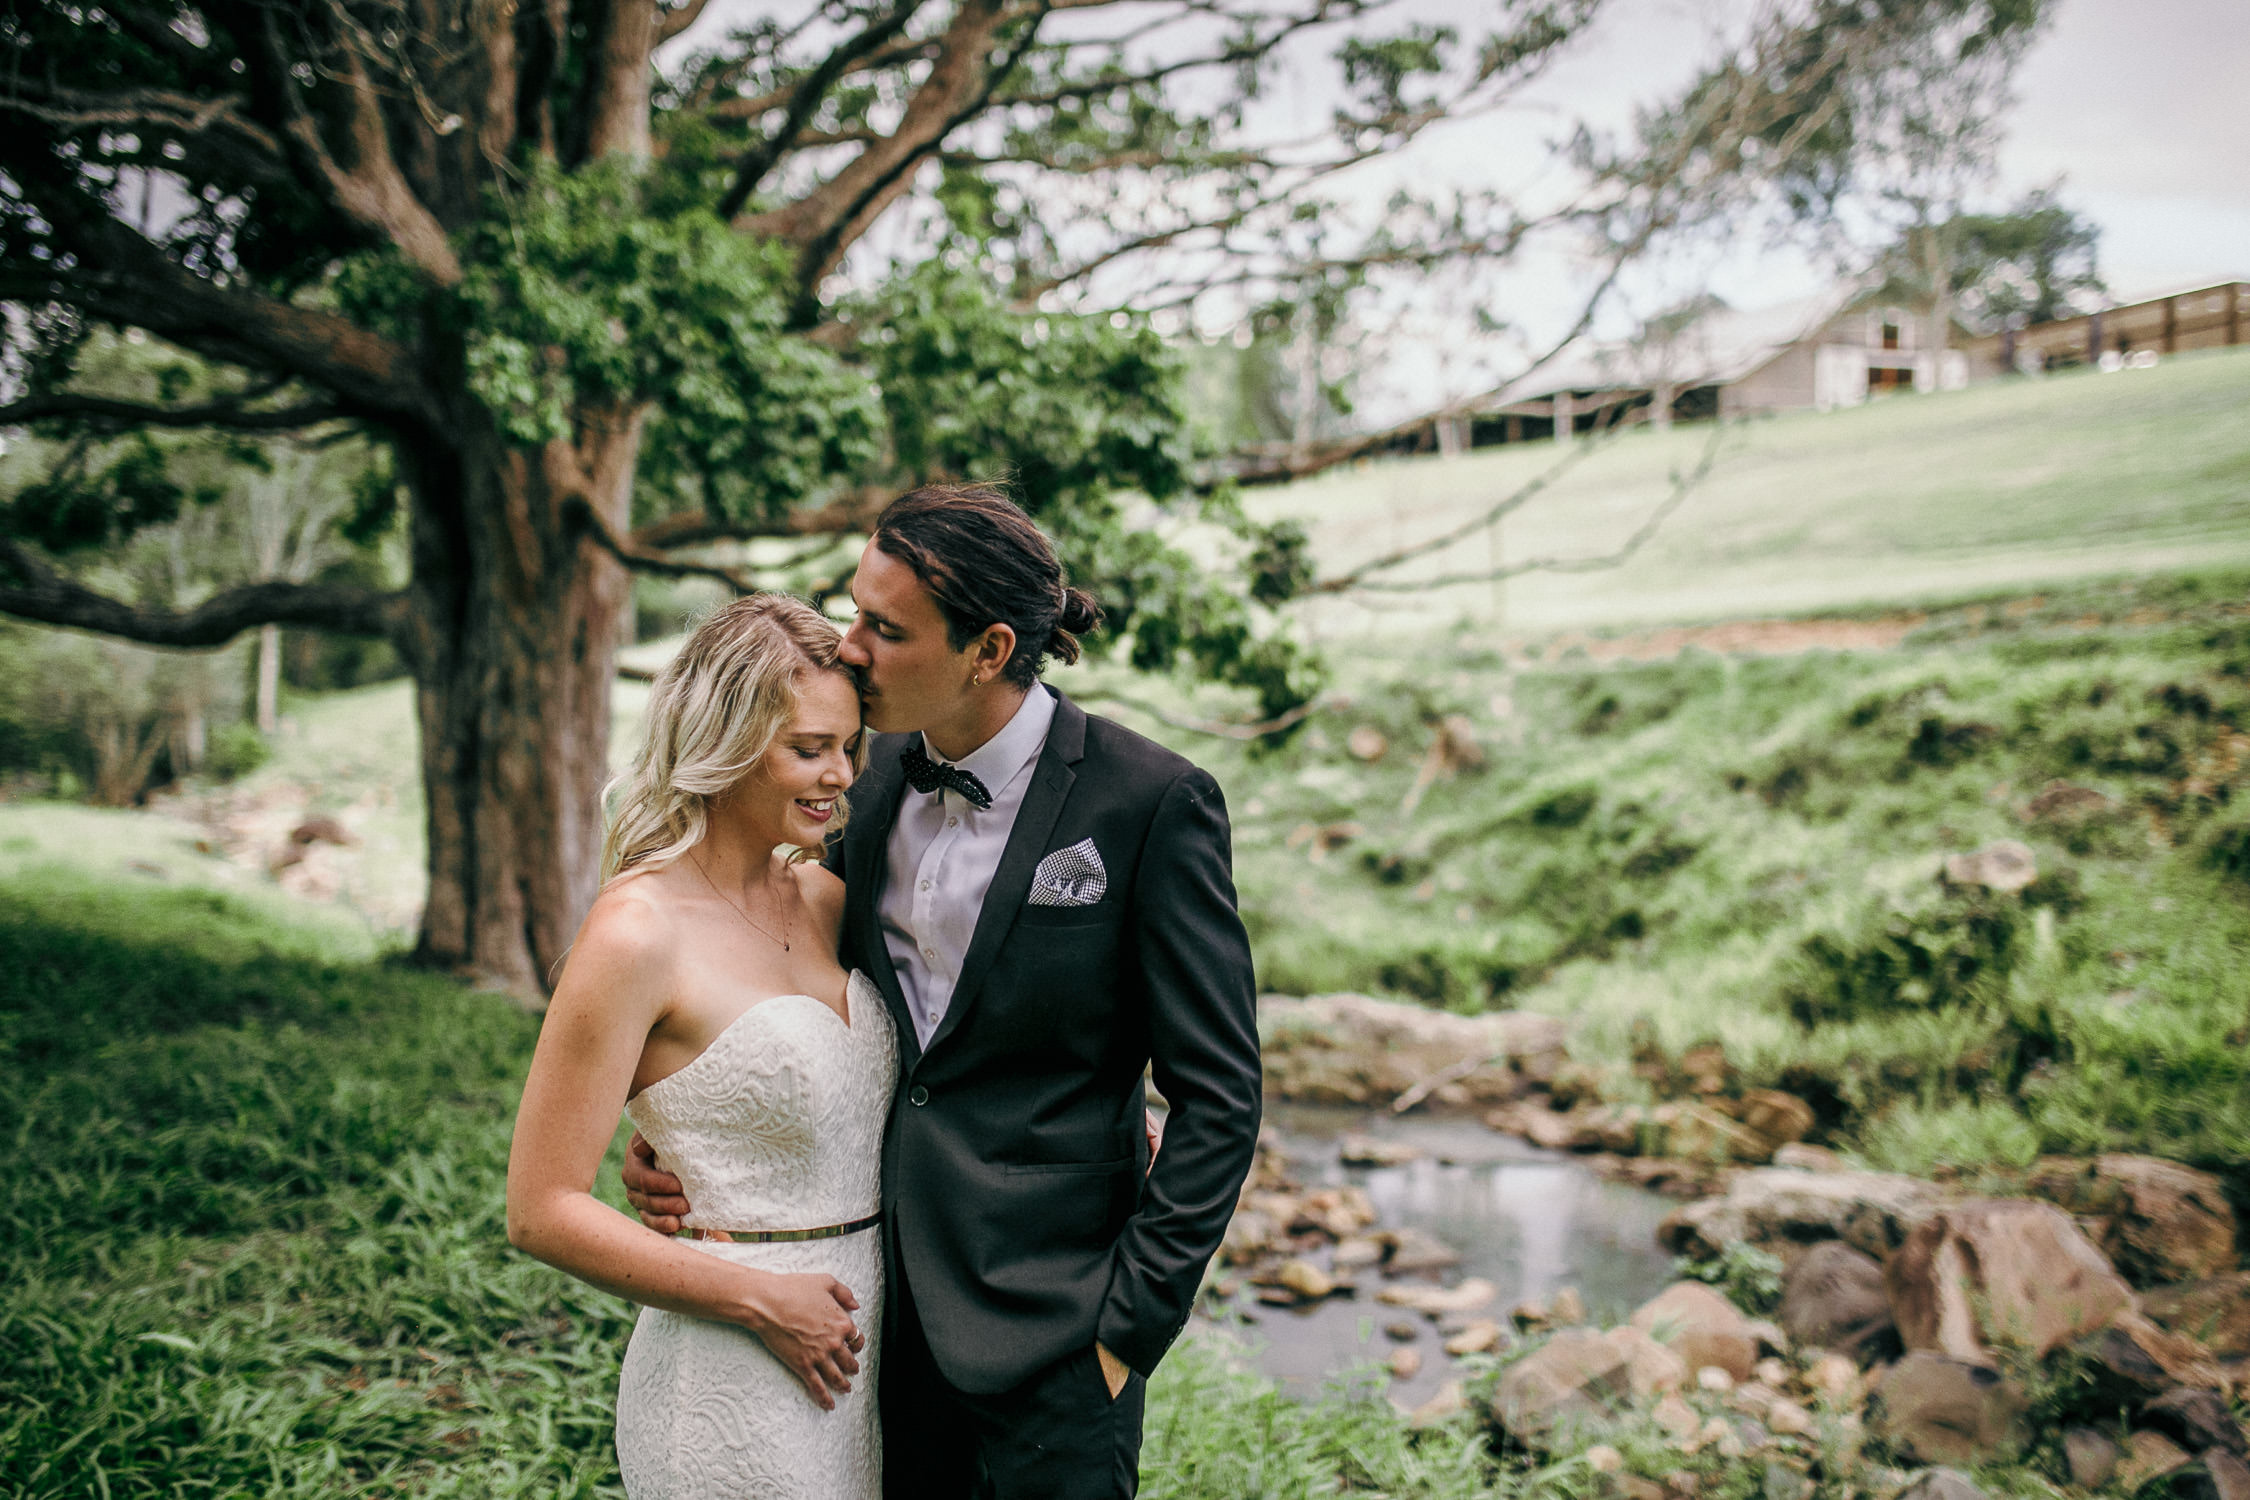 True-North-Photography-Cowbell-Creek-Gold-Coast-wedding-photographer-creek-with-barn-1.jpg